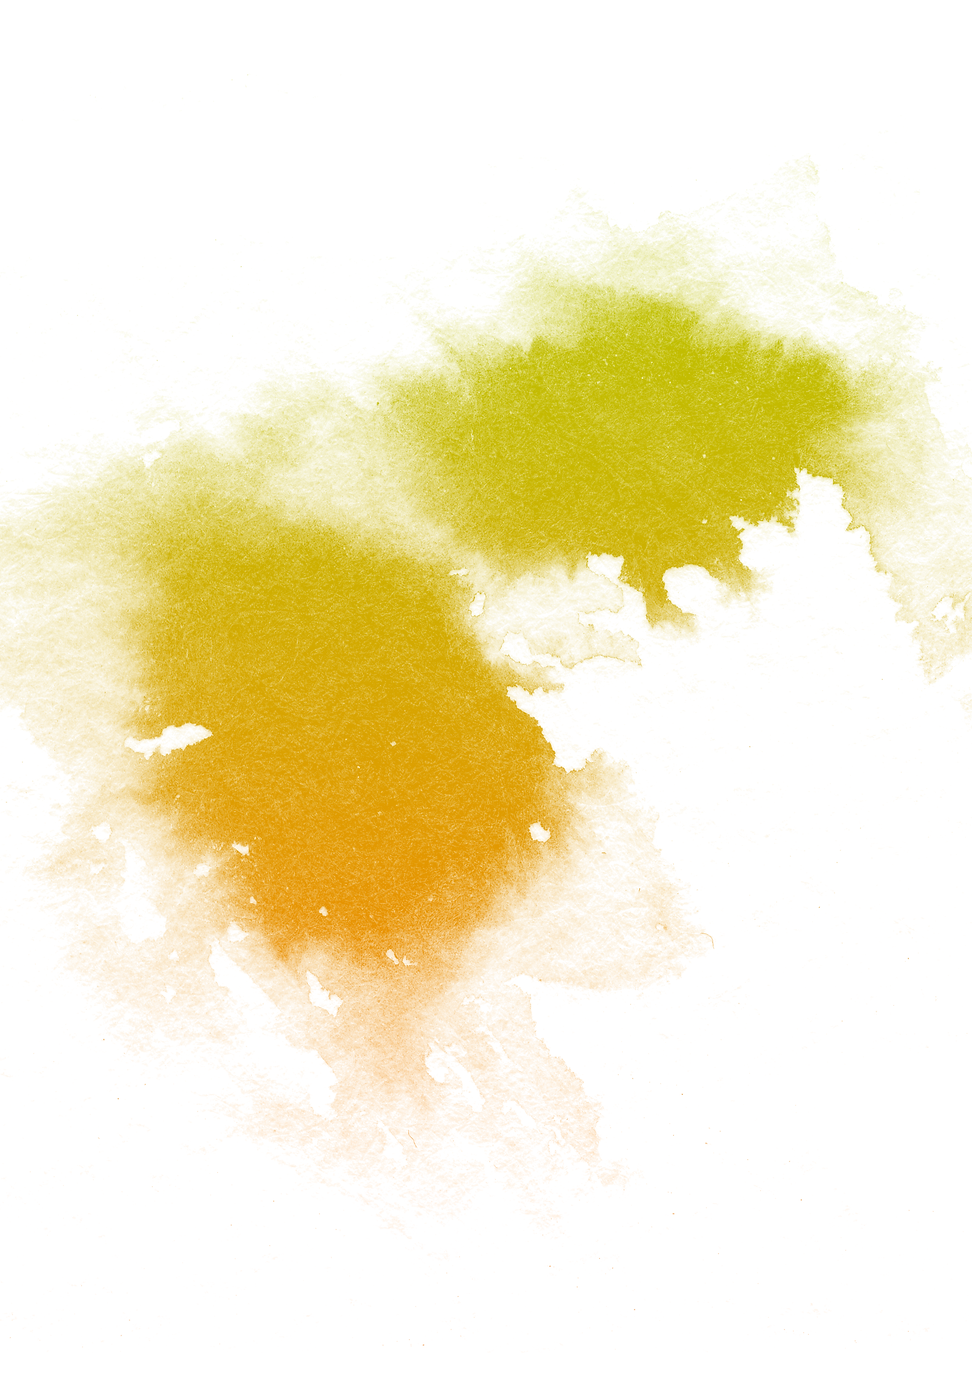 yellow splodge.png